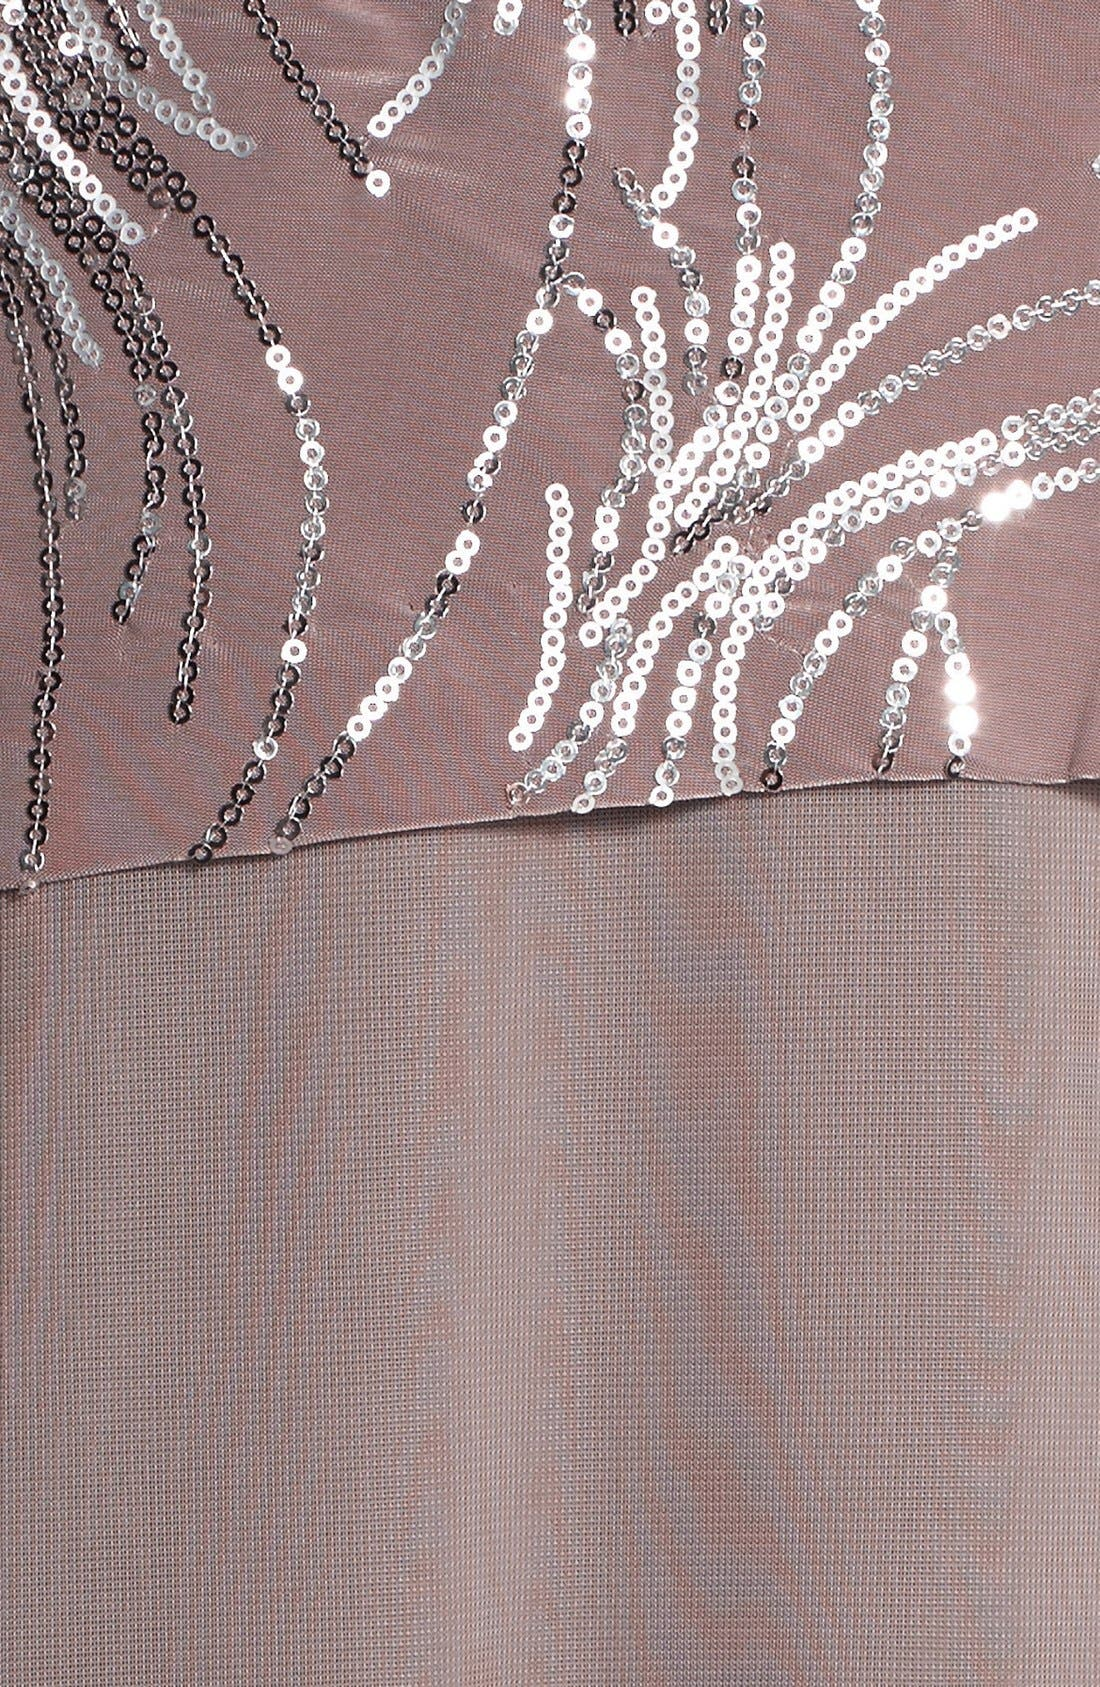 Alternate Image 5  - Alex Evenings Sequin Mock Two-Piece Dress with Jacket (Plus Size)